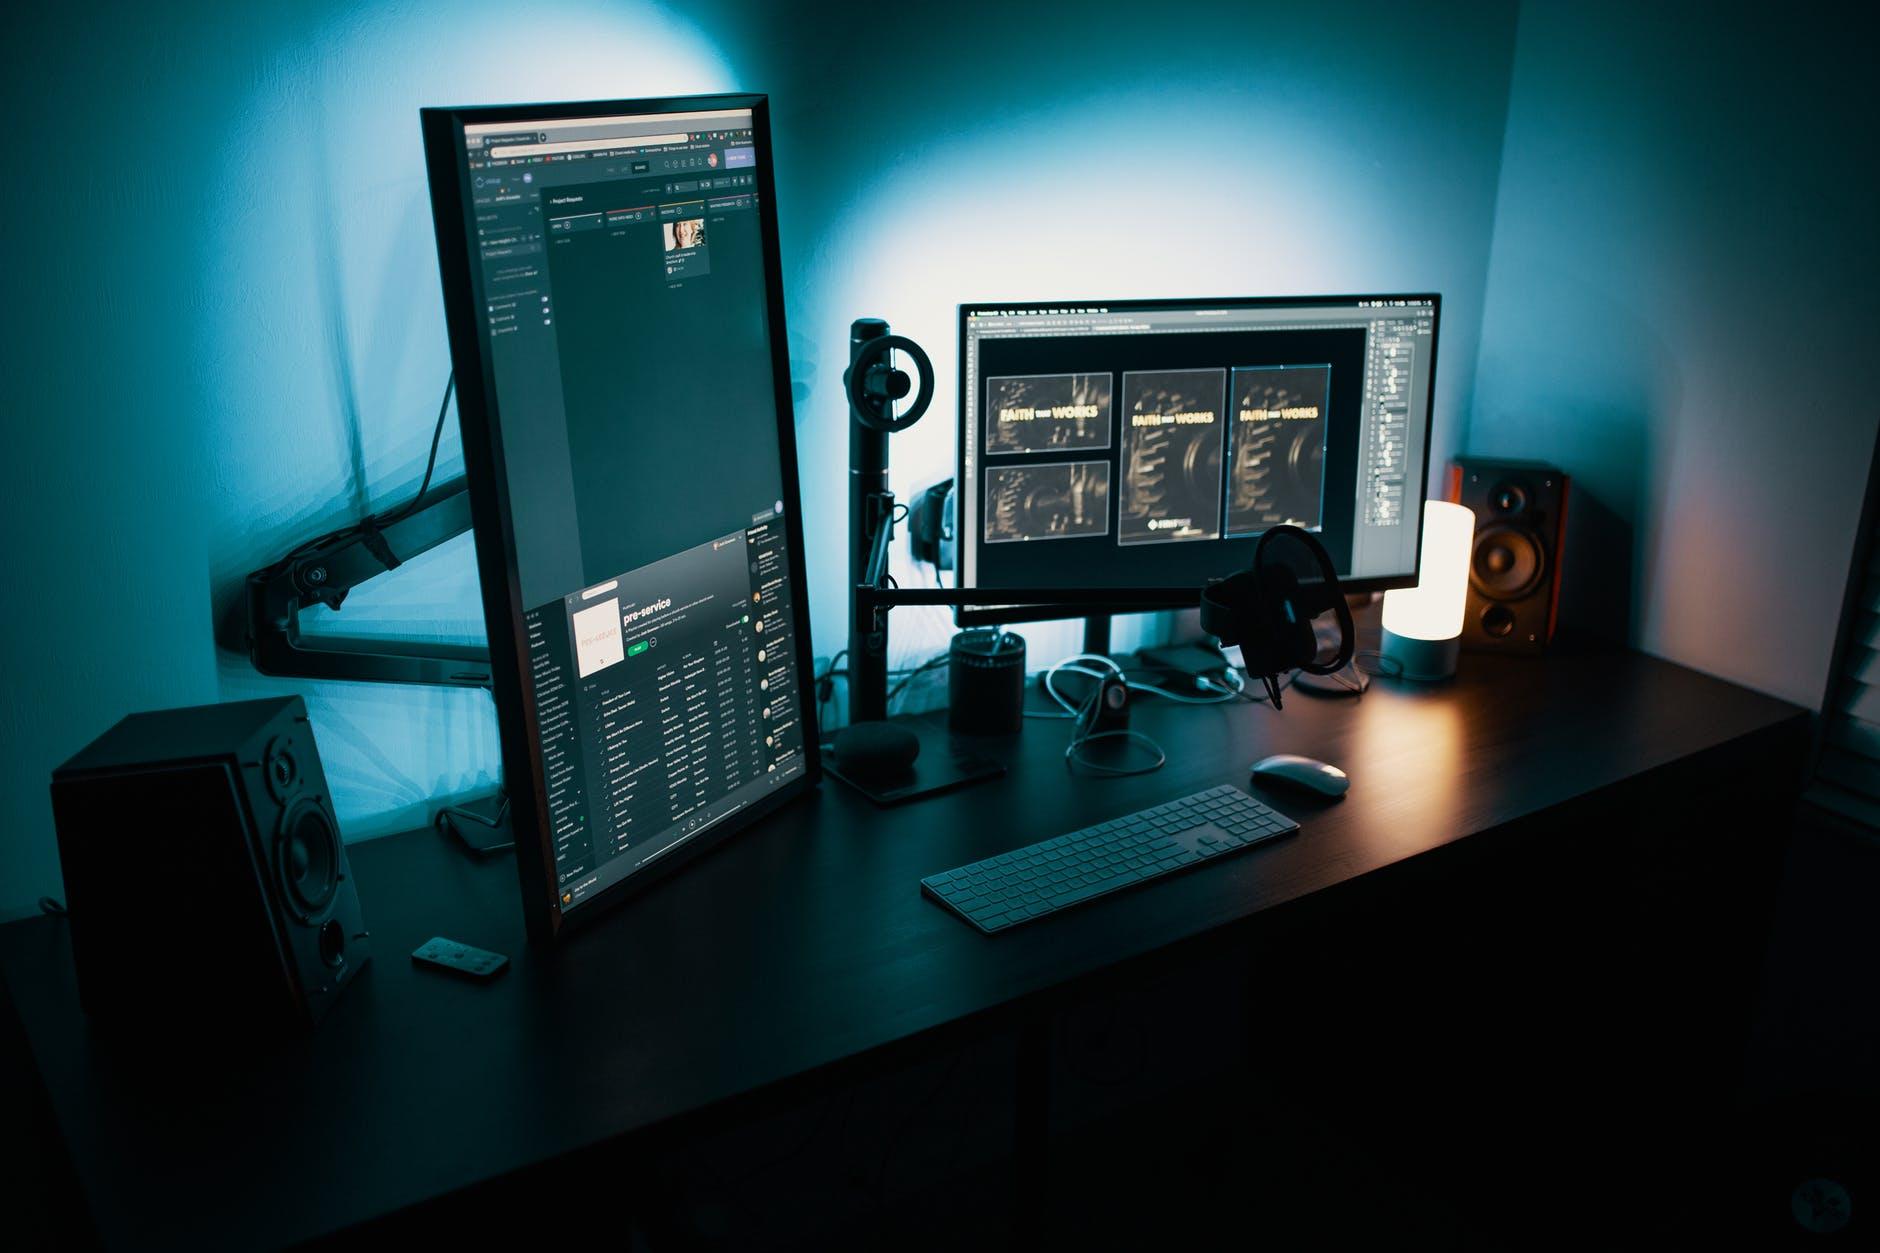 equipo-de-computo-para-empresas-workstation